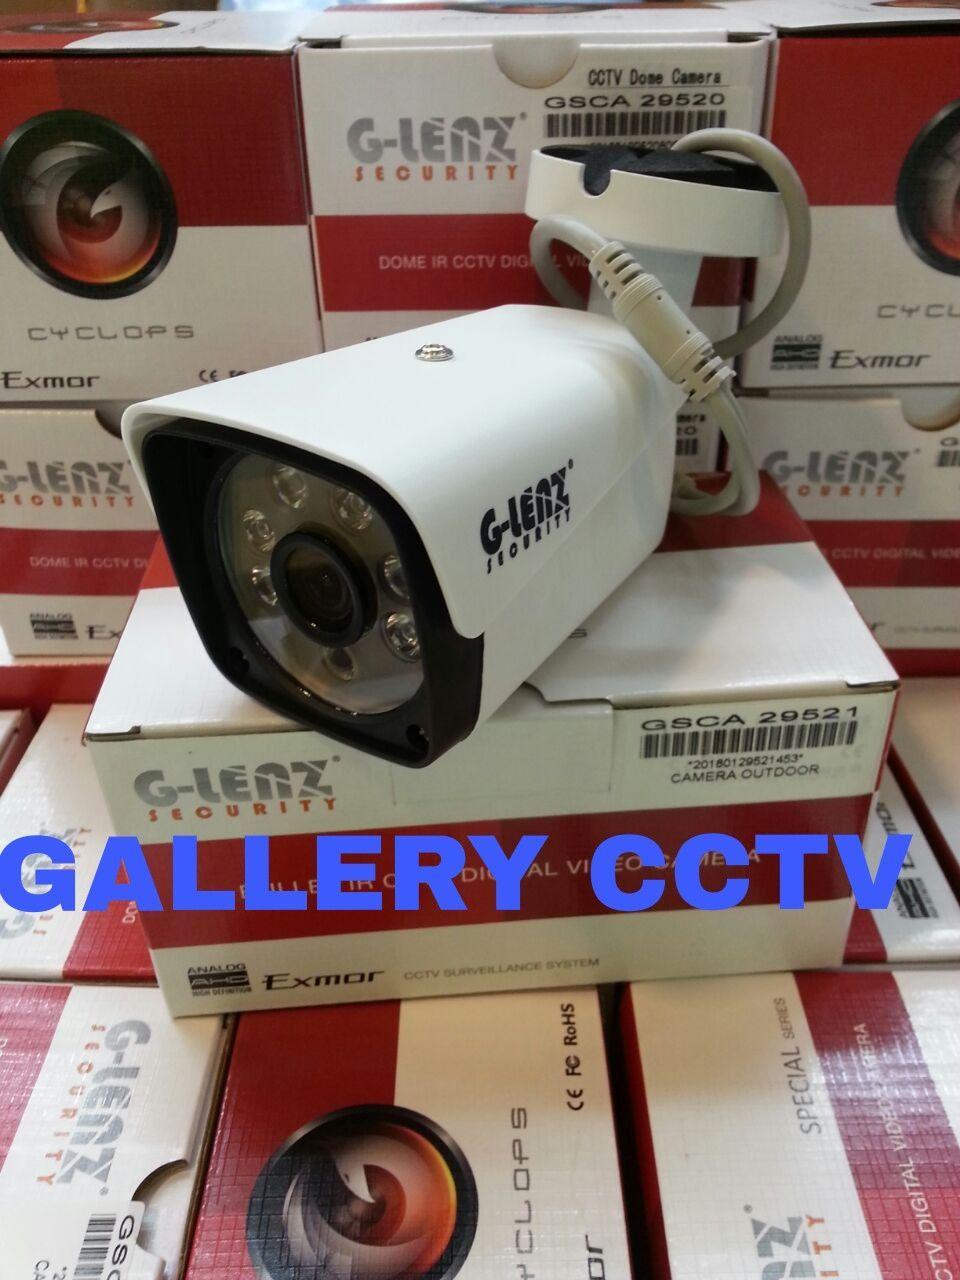 kamera cctv glenz 2.0mp 1080p outdoor ic sony exmor